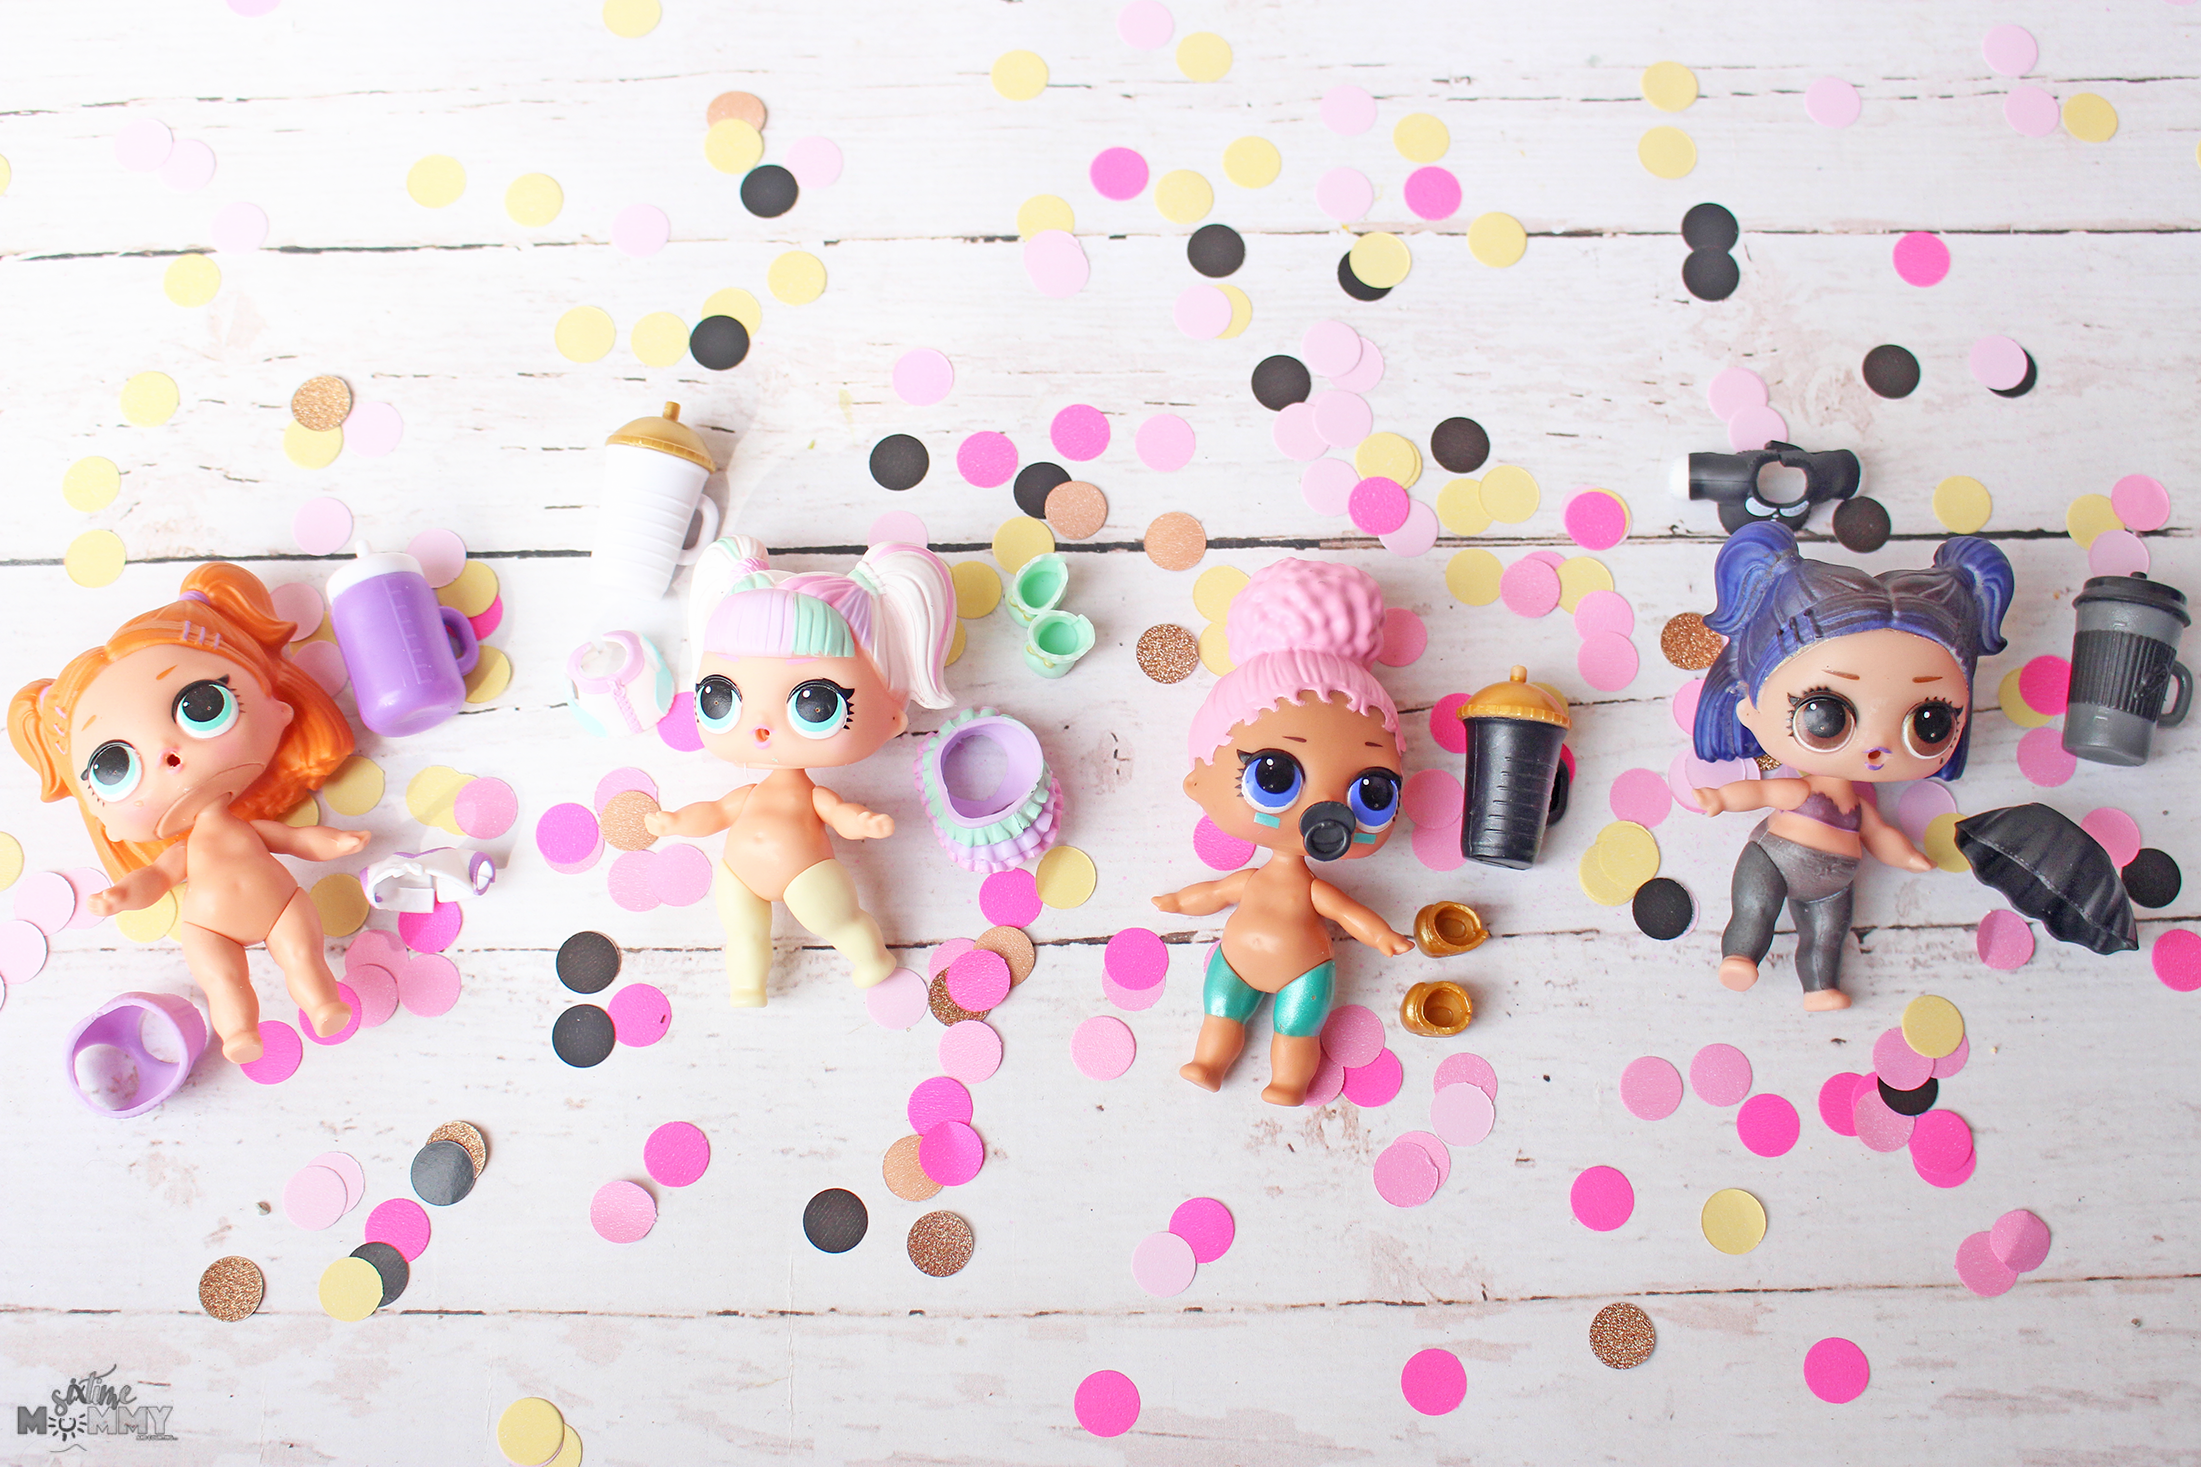 LOL Surprise! Confetti Pop, Pets and Pearl Surprise Dolls